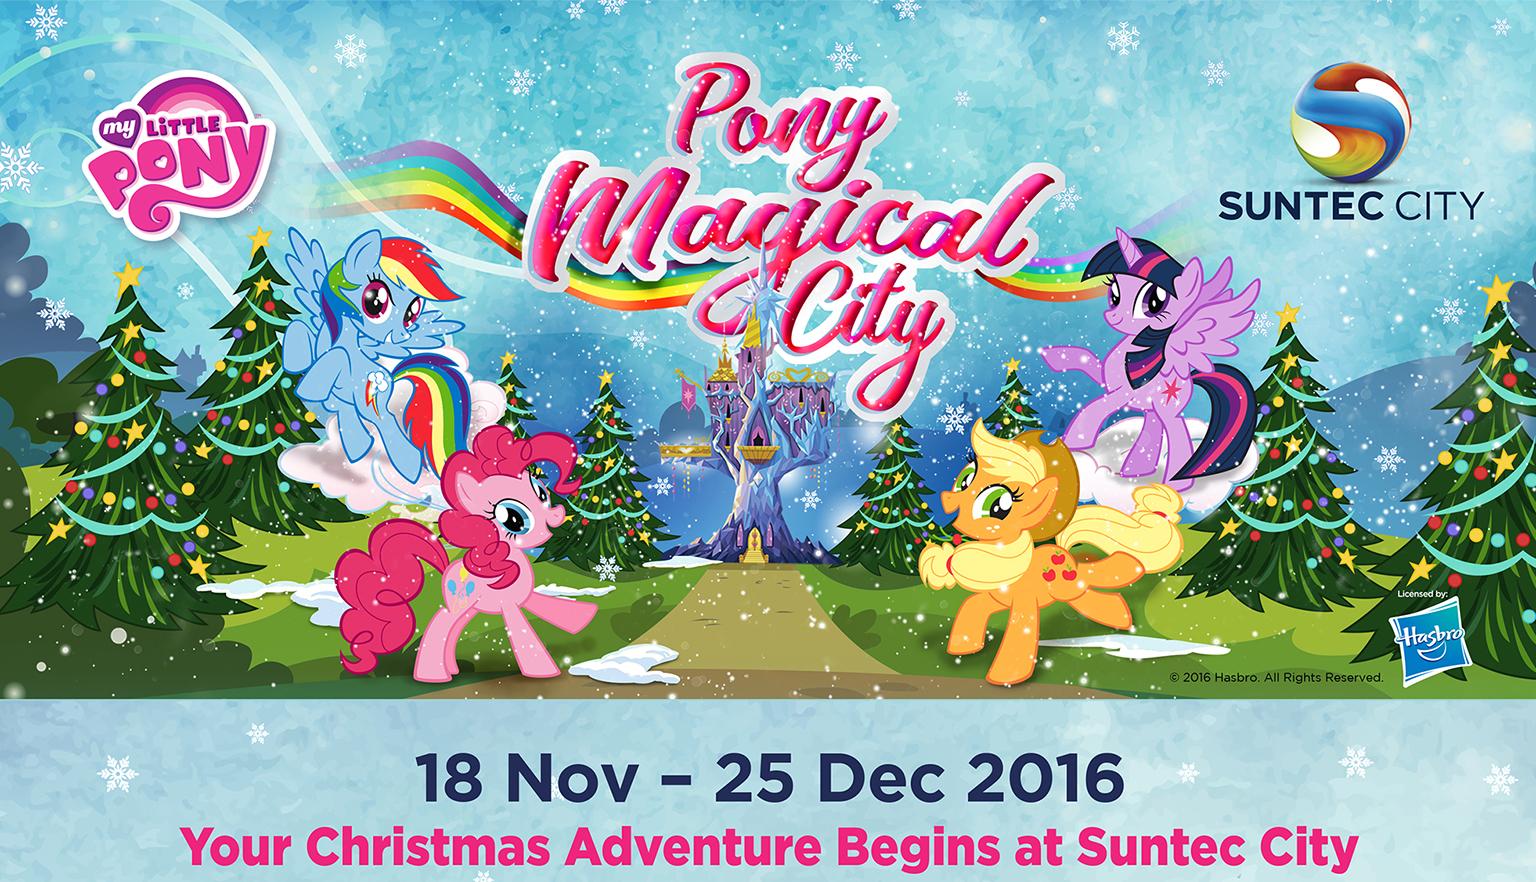 My Little Pony Christmas.Pony Magical City Christmas At Suntec City Suntec City